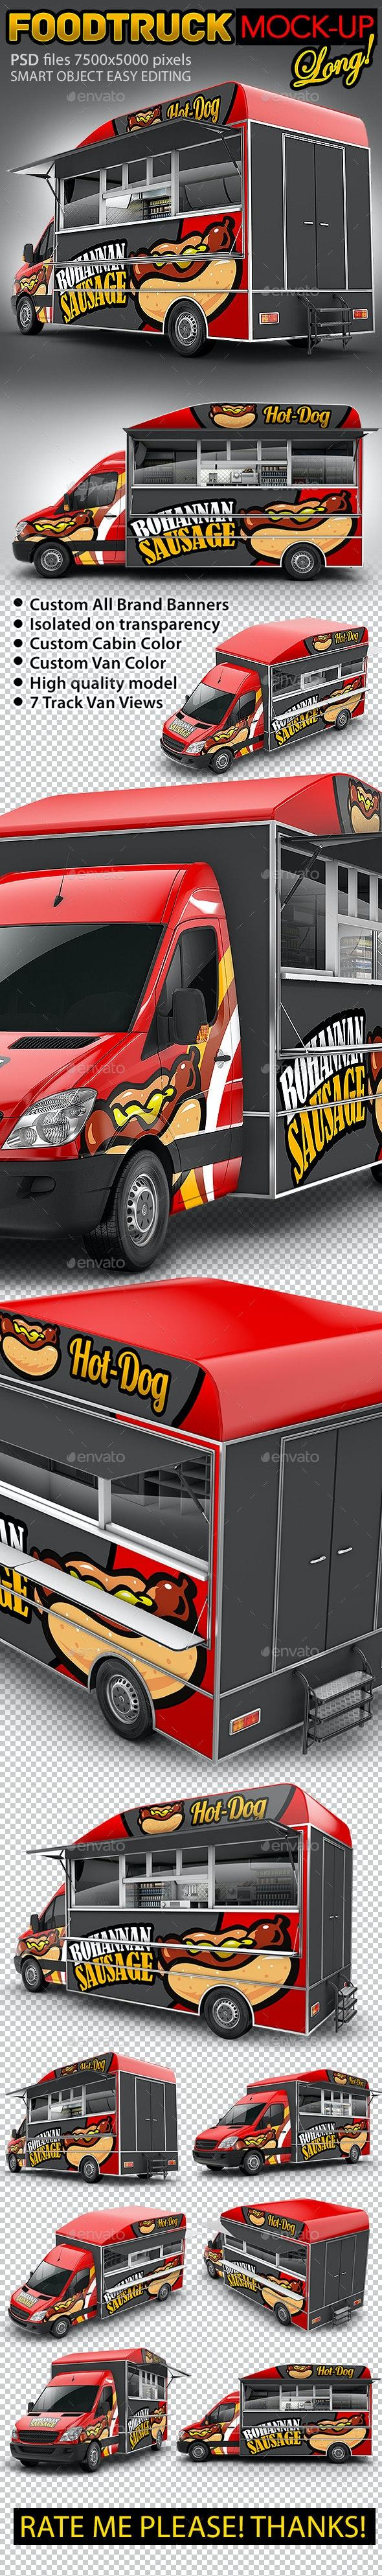 Food Truck Hod-Dog Mock-Up. Van eatery mockup - Vehicle Wraps Print